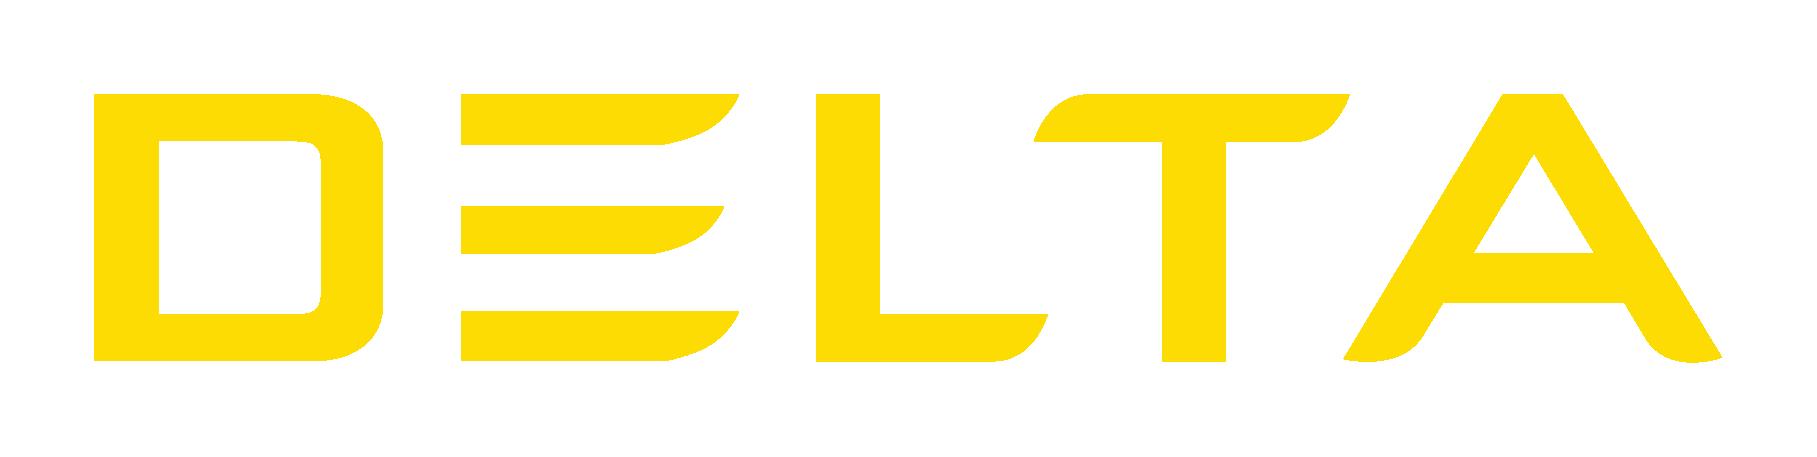 Delta - Yellow